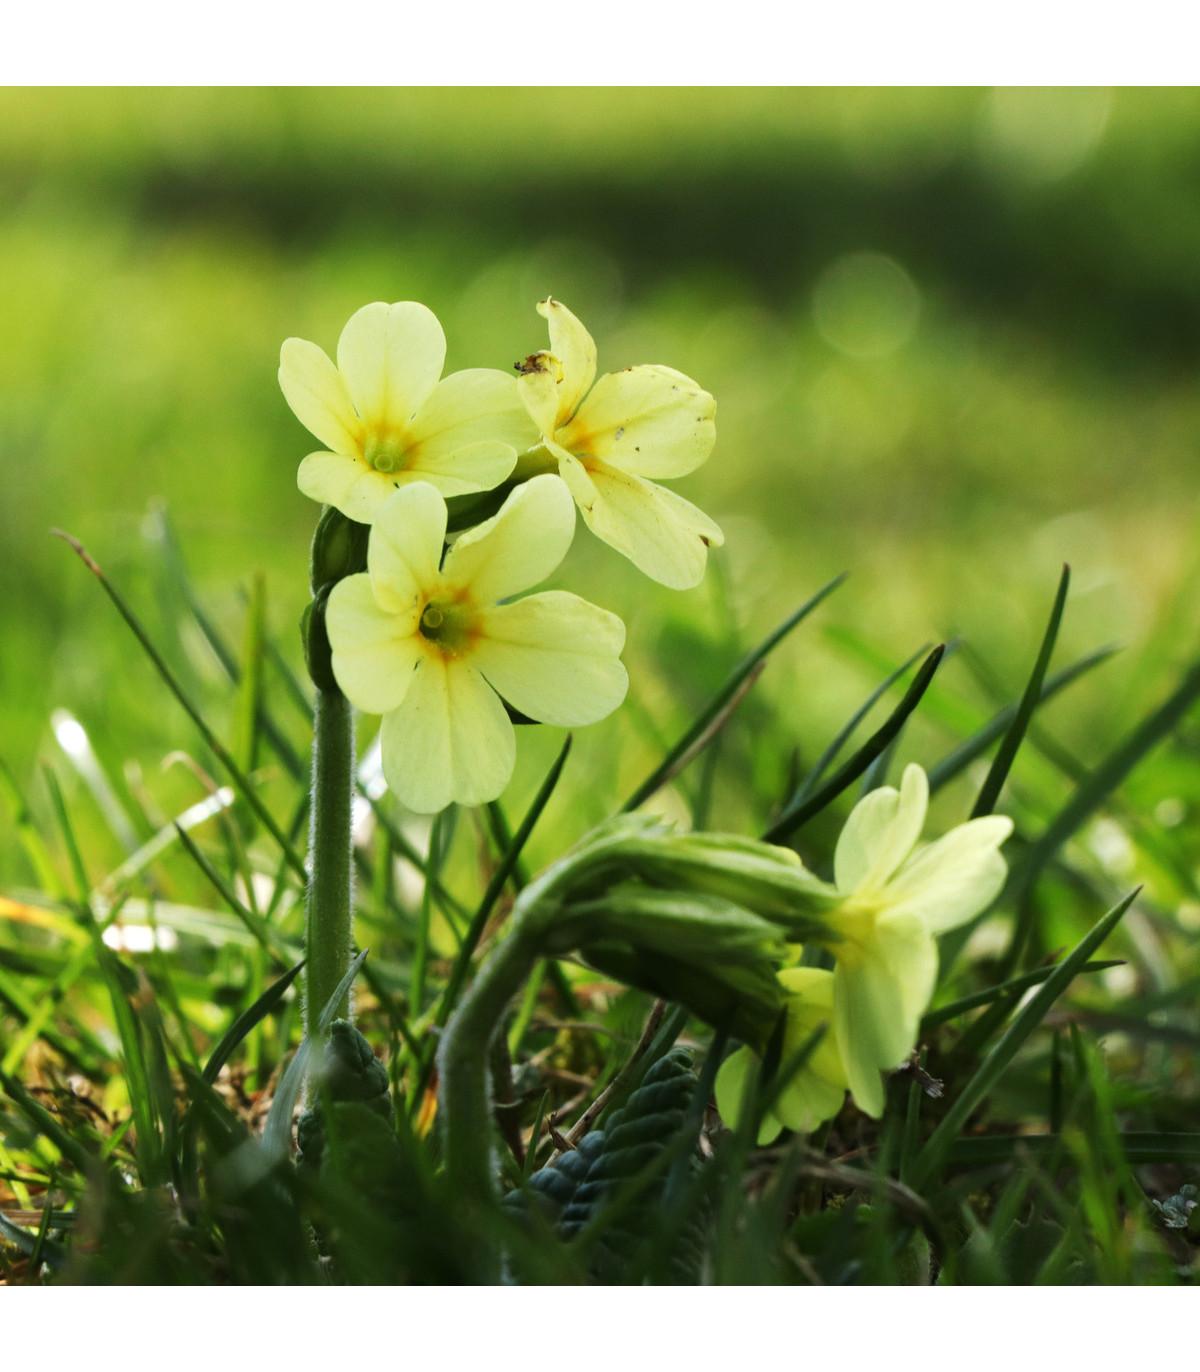 Prvosienka vyššia Oxlip - Primula elatior - semená